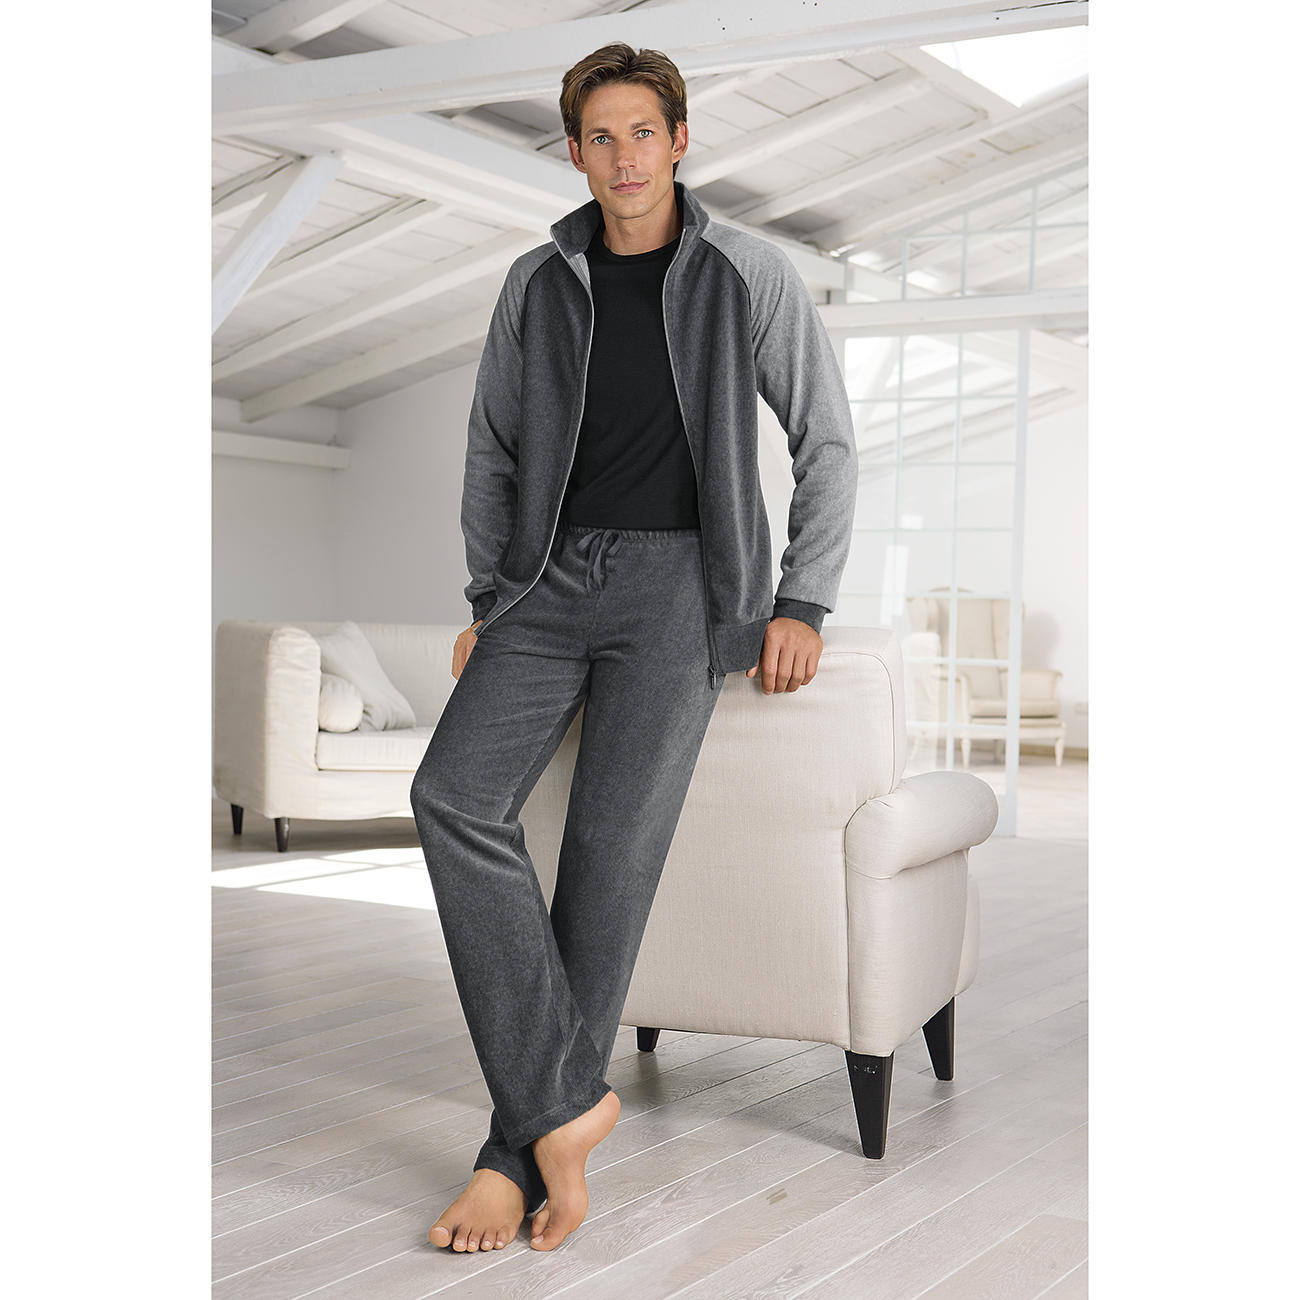 Zimmerli Herren-Homesuit :: Grau - 52 - Herren - Erwachsene